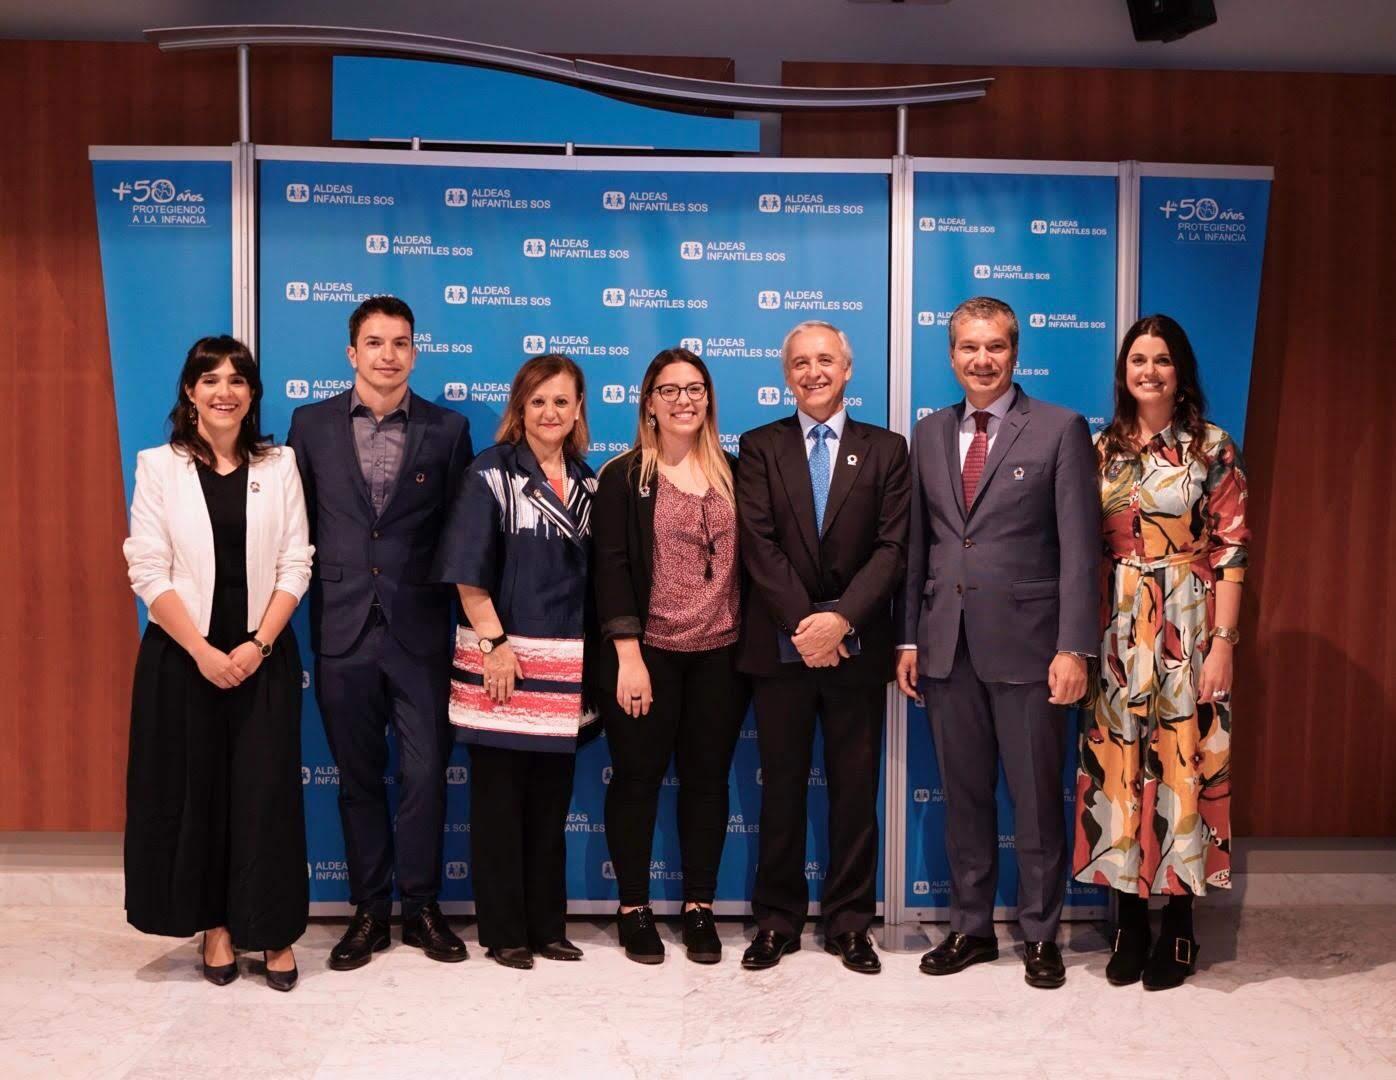 Sofía García, Rubén Carricondo, Cristina Gallach, Ana Hernández, Pedro Puig, Javier Solans y Sol Cardozo.